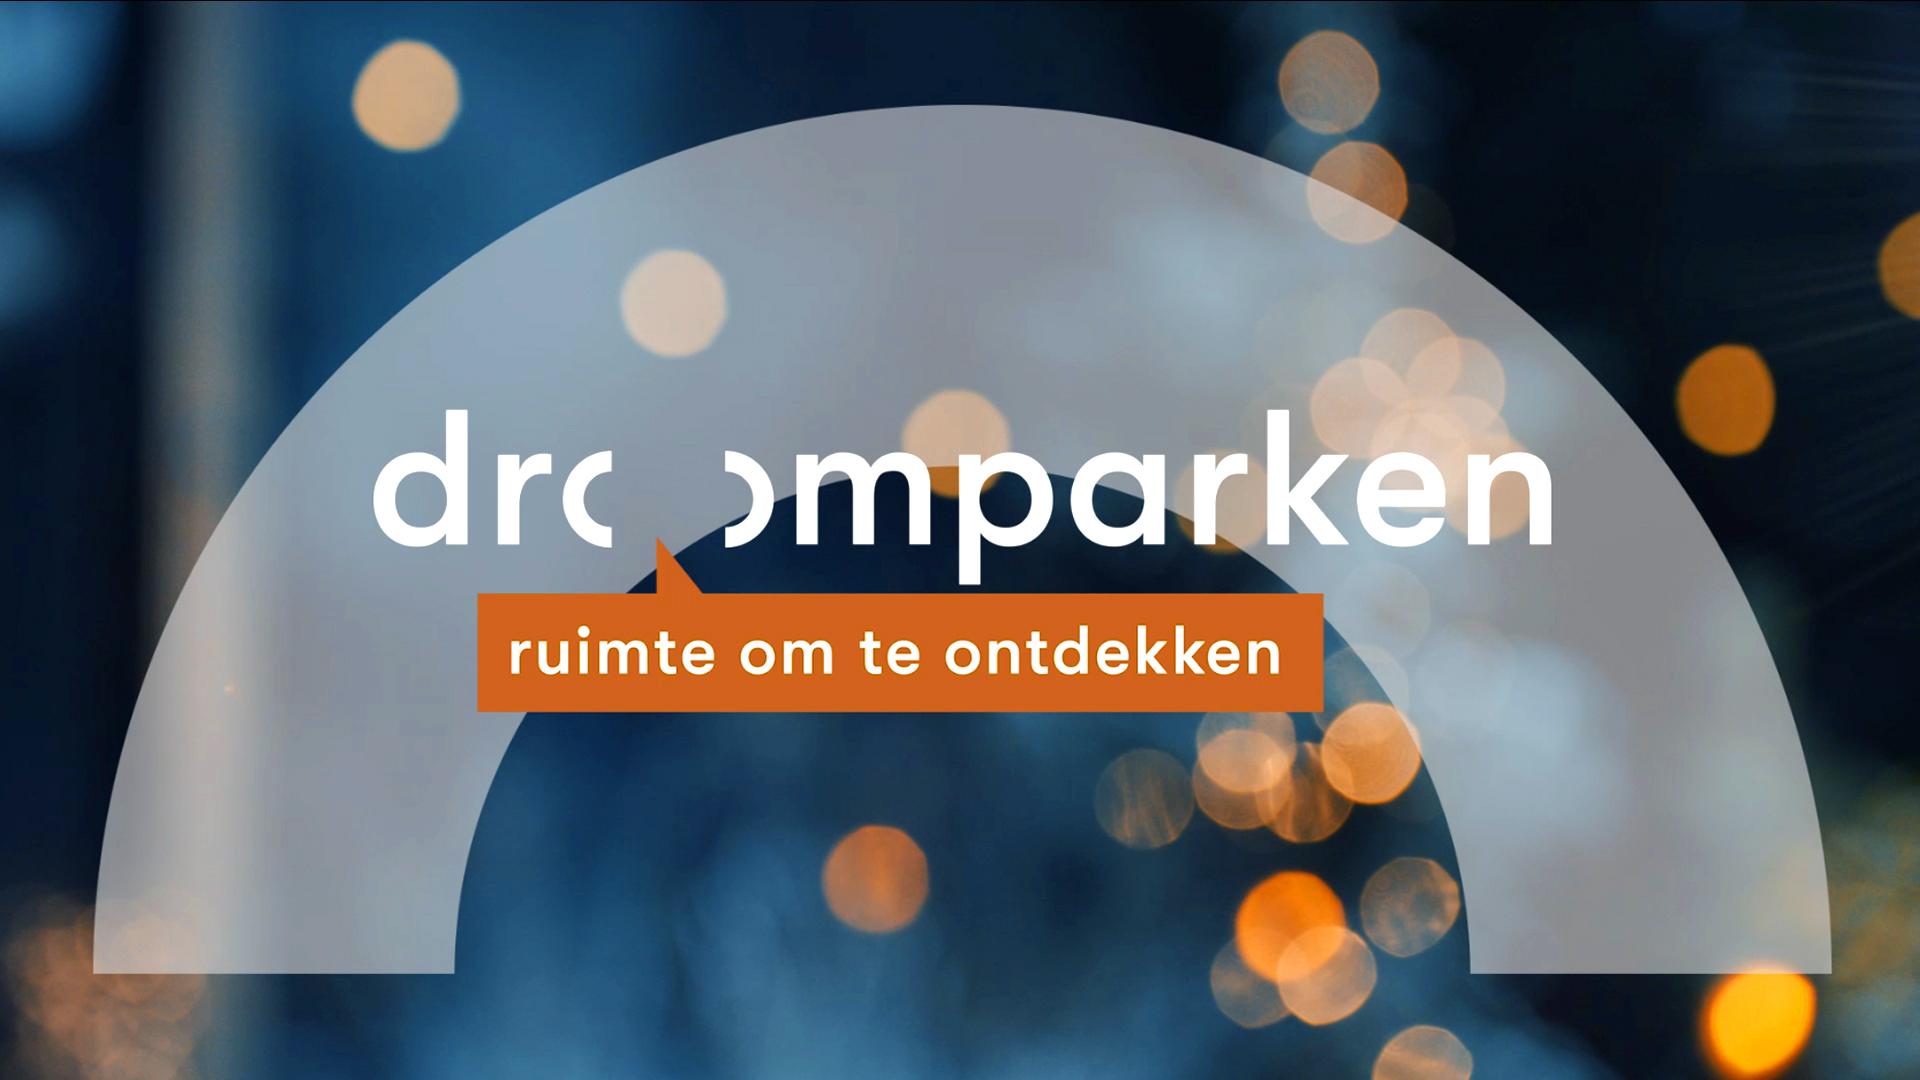 Droomparken web 2019